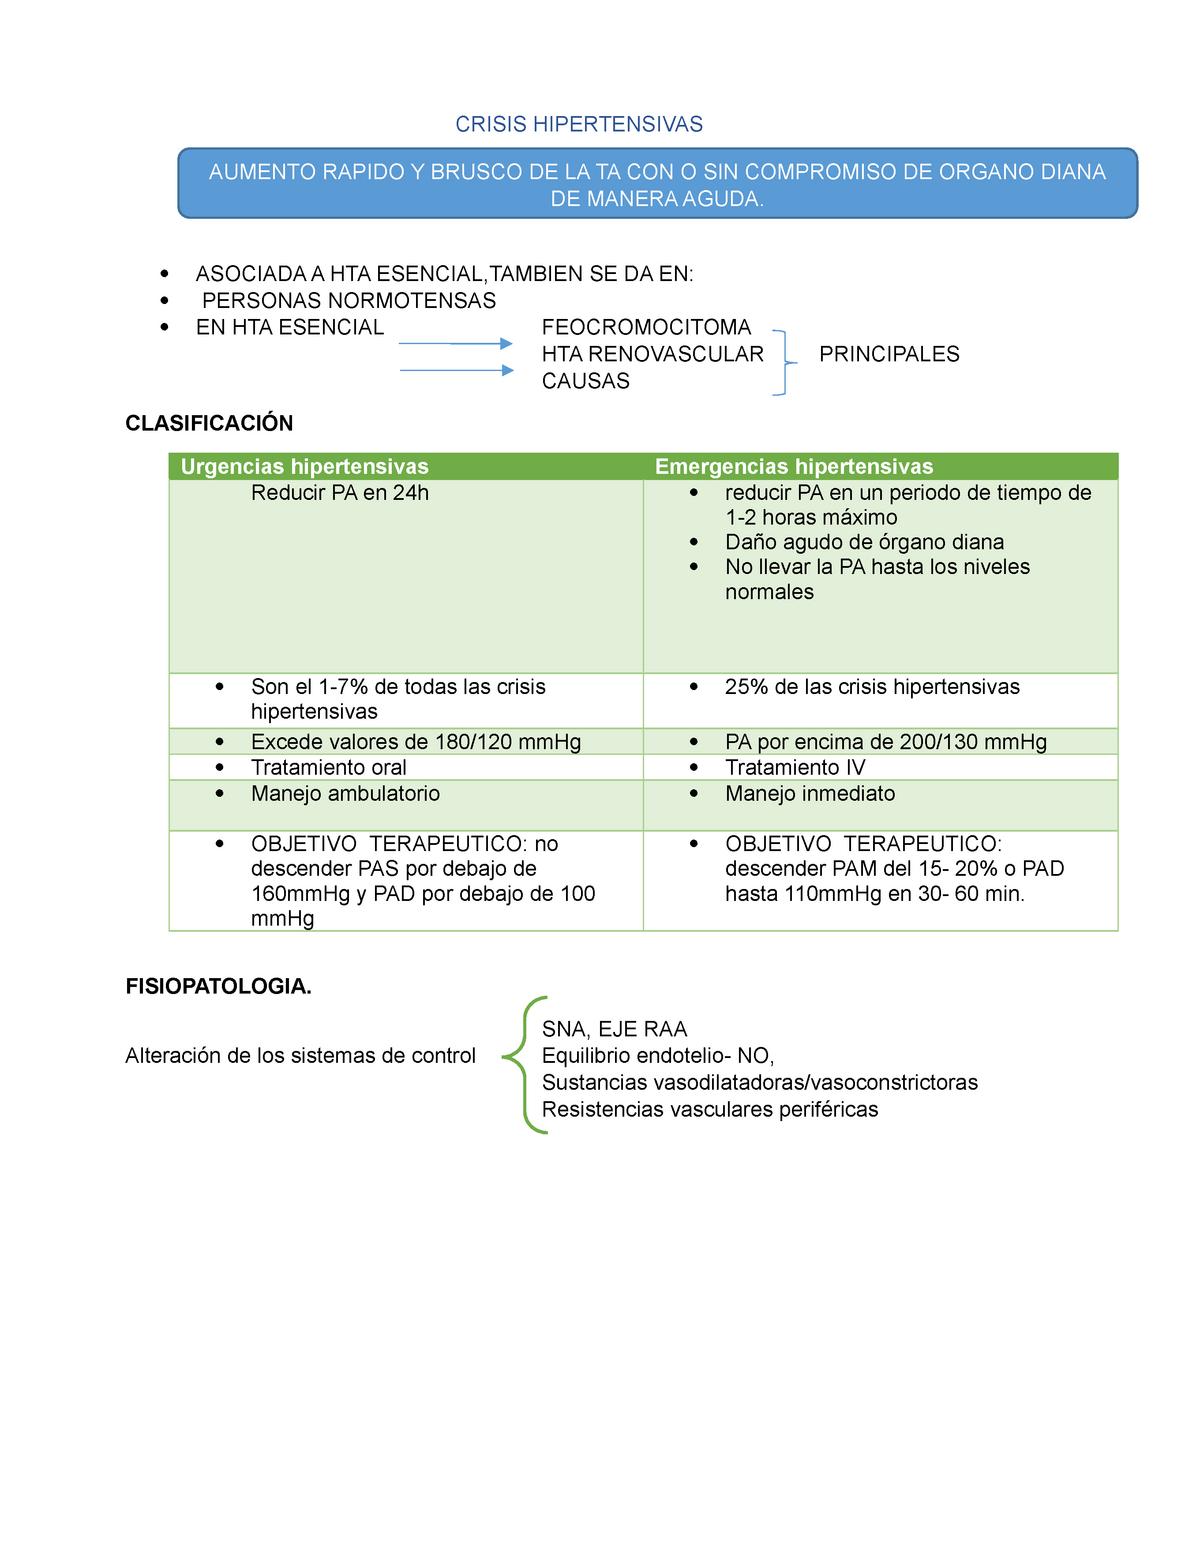 Hidralazina e hipertensión de rebote